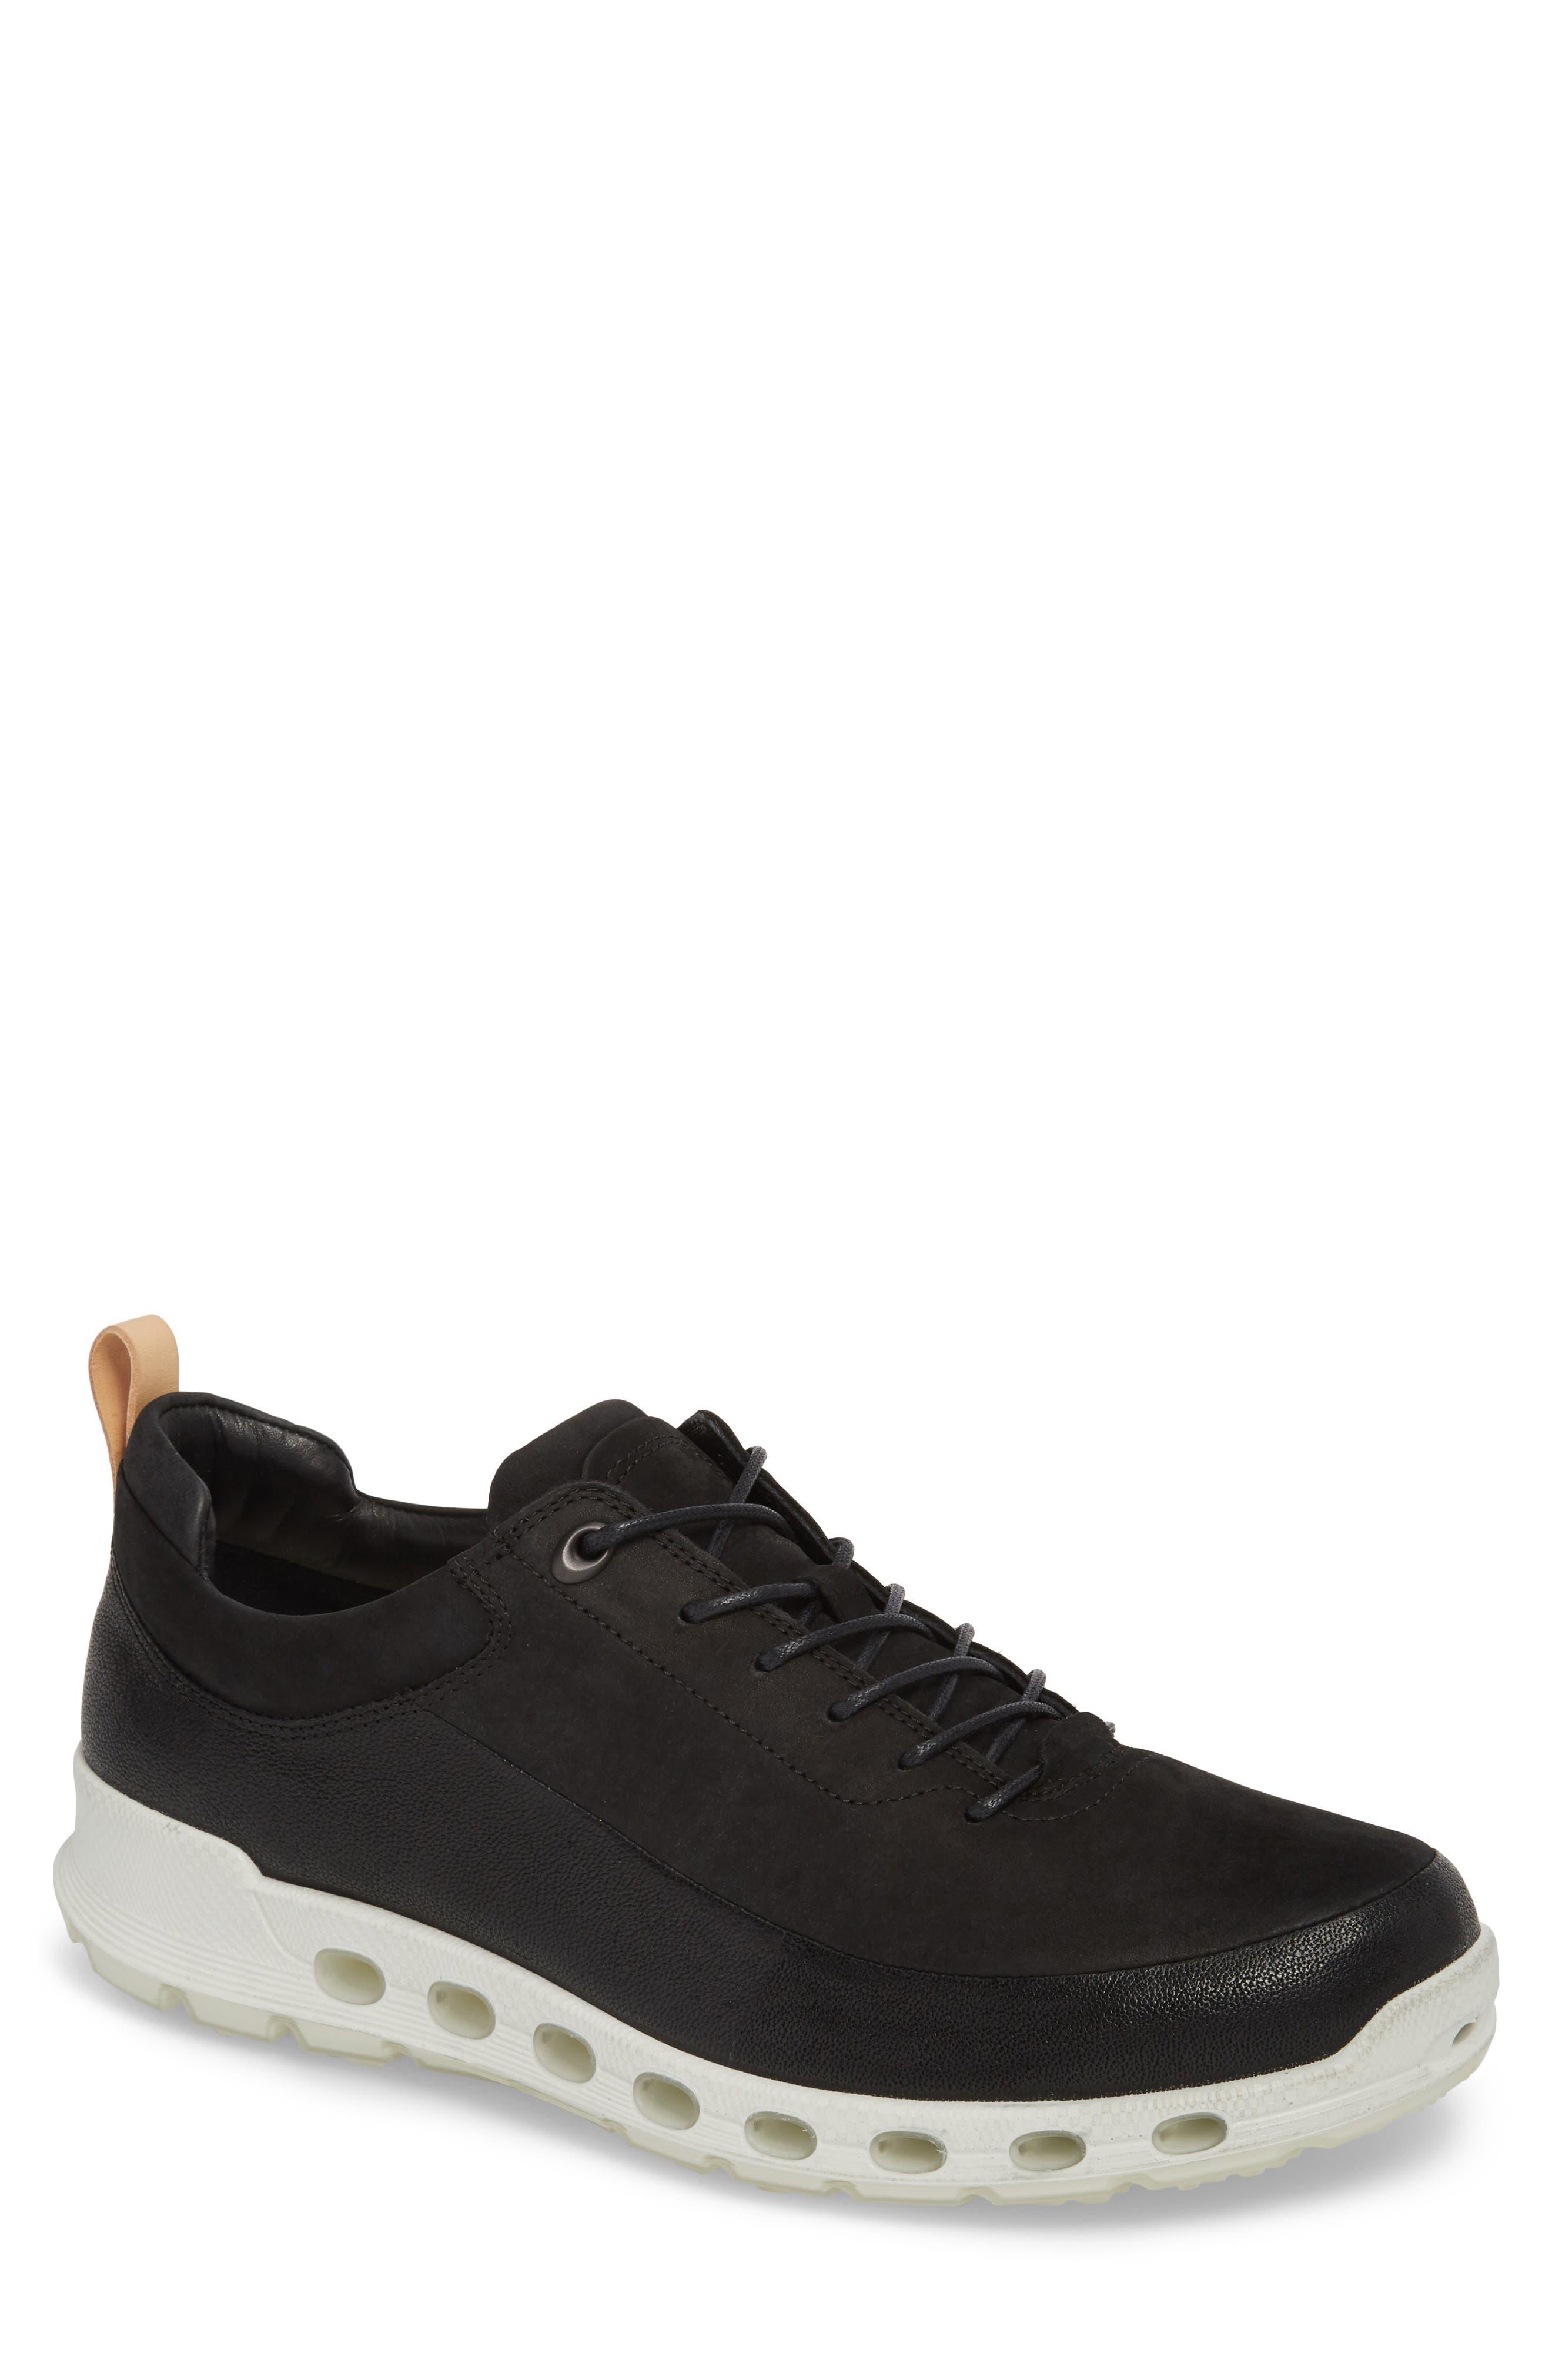 Cool 2.0 Gore-Tex<sup>®</sup> Sneaker,                             Main thumbnail 1, color,                             001